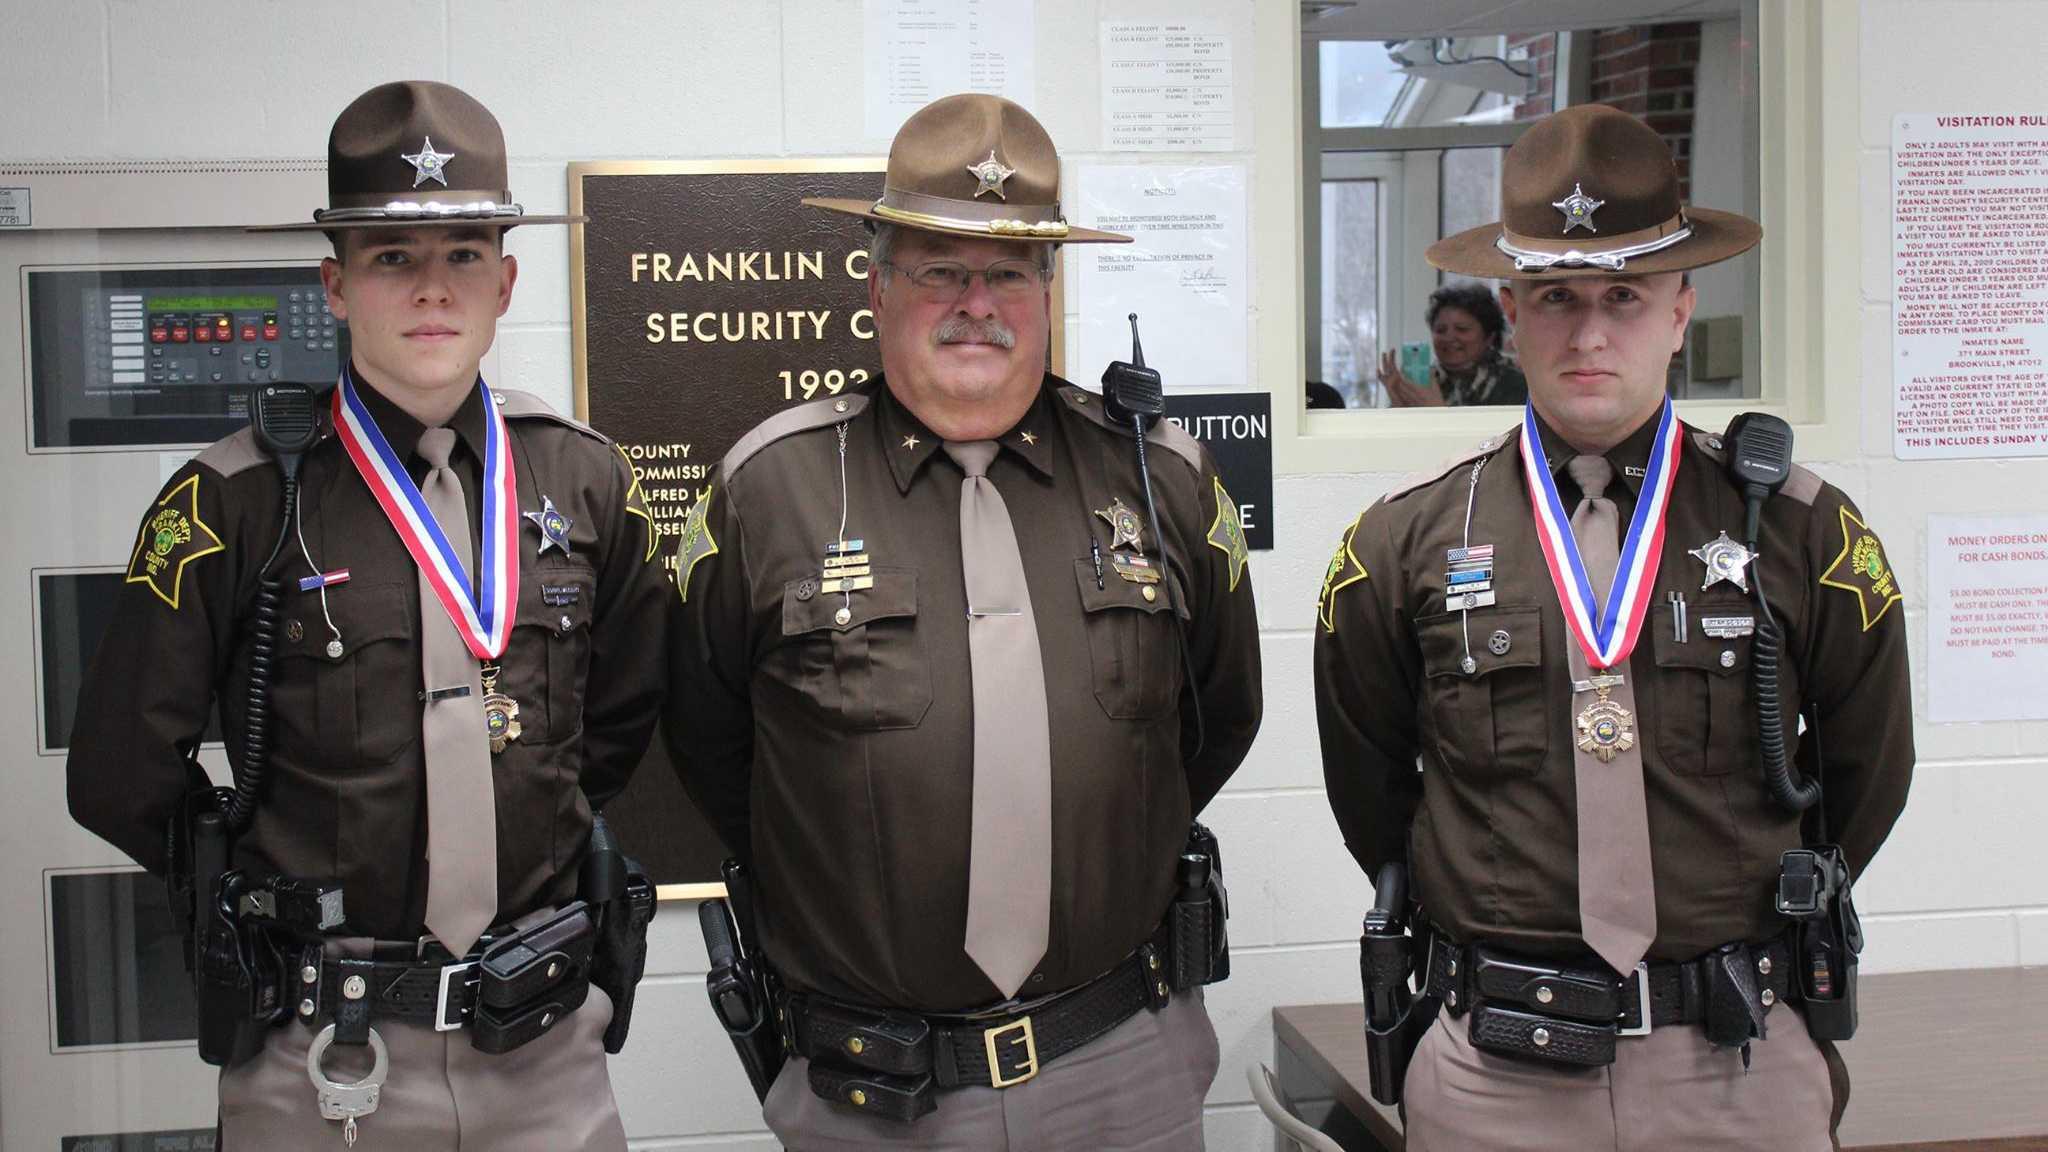 Deputy Samuel Williams, Sheriff Kenneth Murphy, Deputy Ryan Geiser